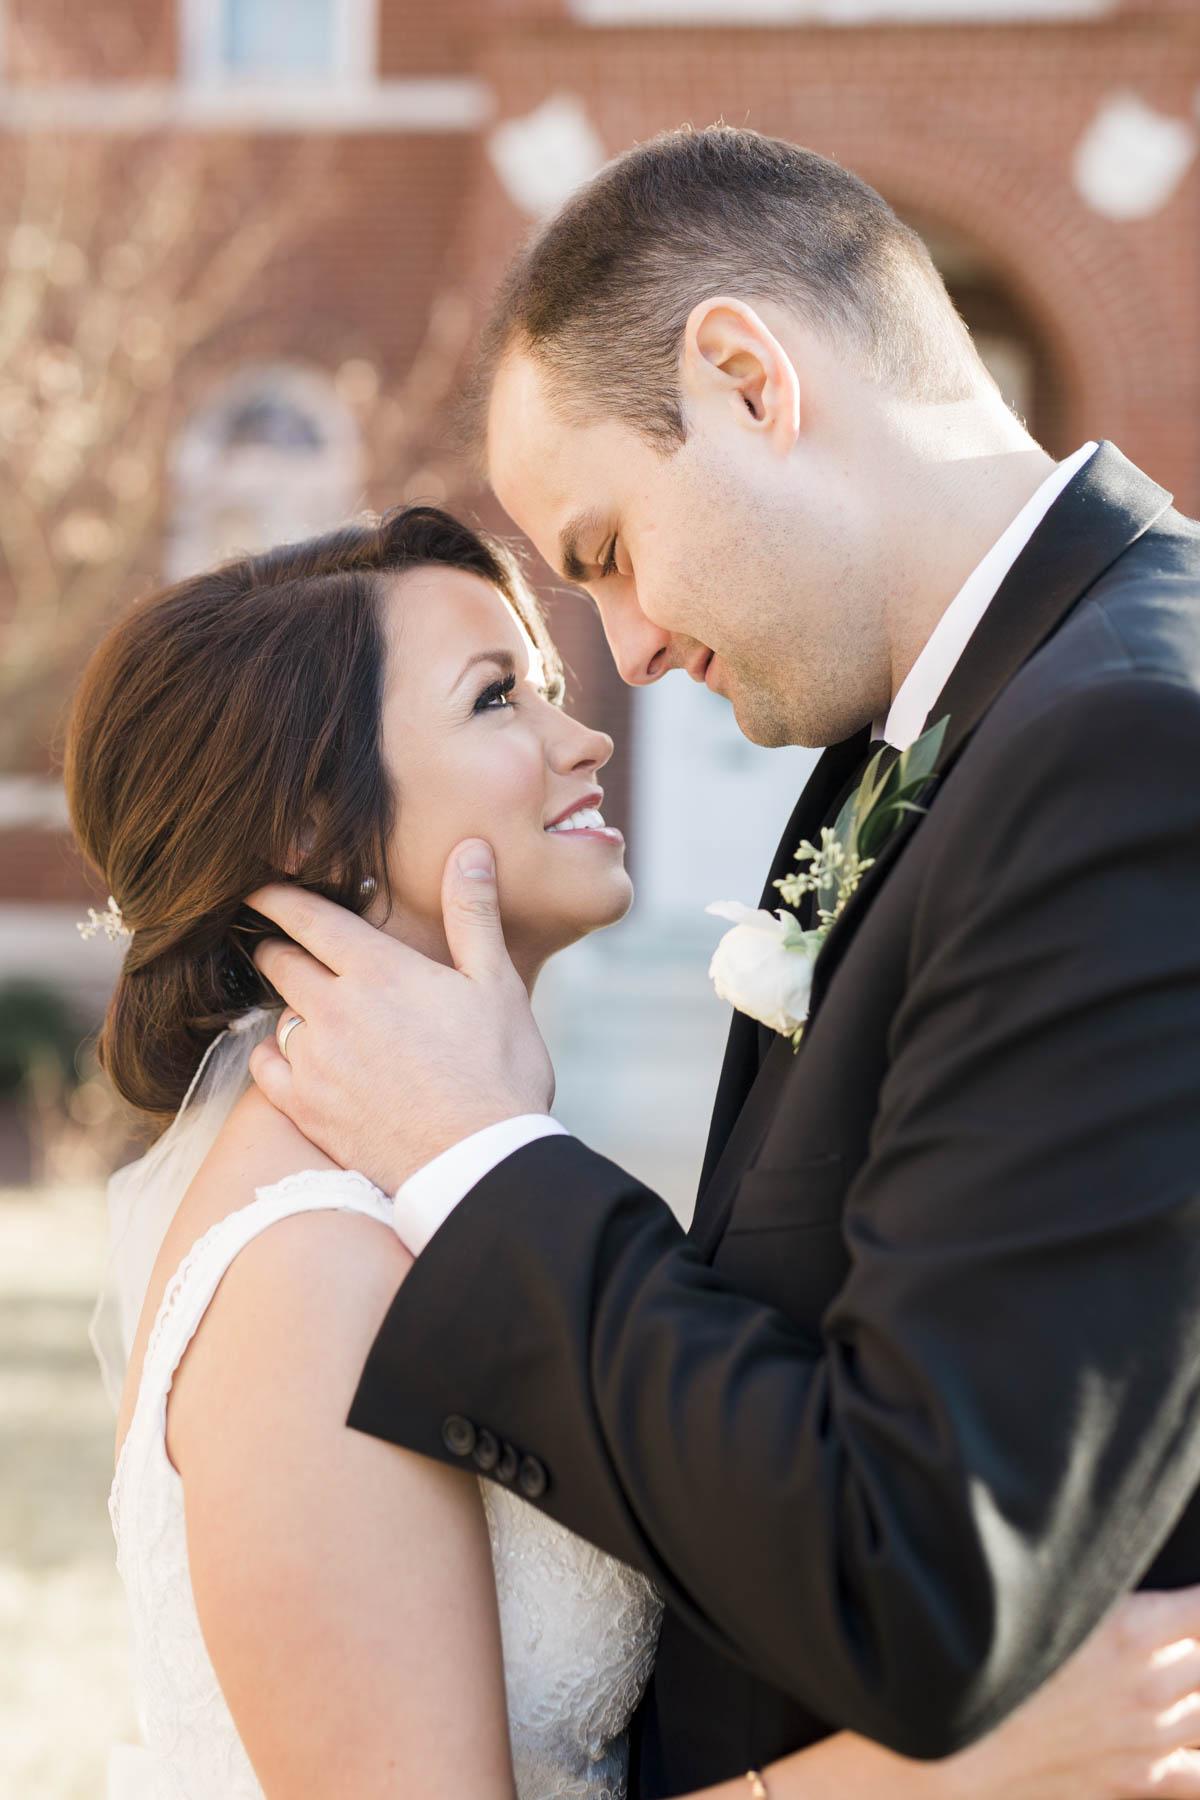 shotbychelsea_wedding_photography_blog-2.jpg